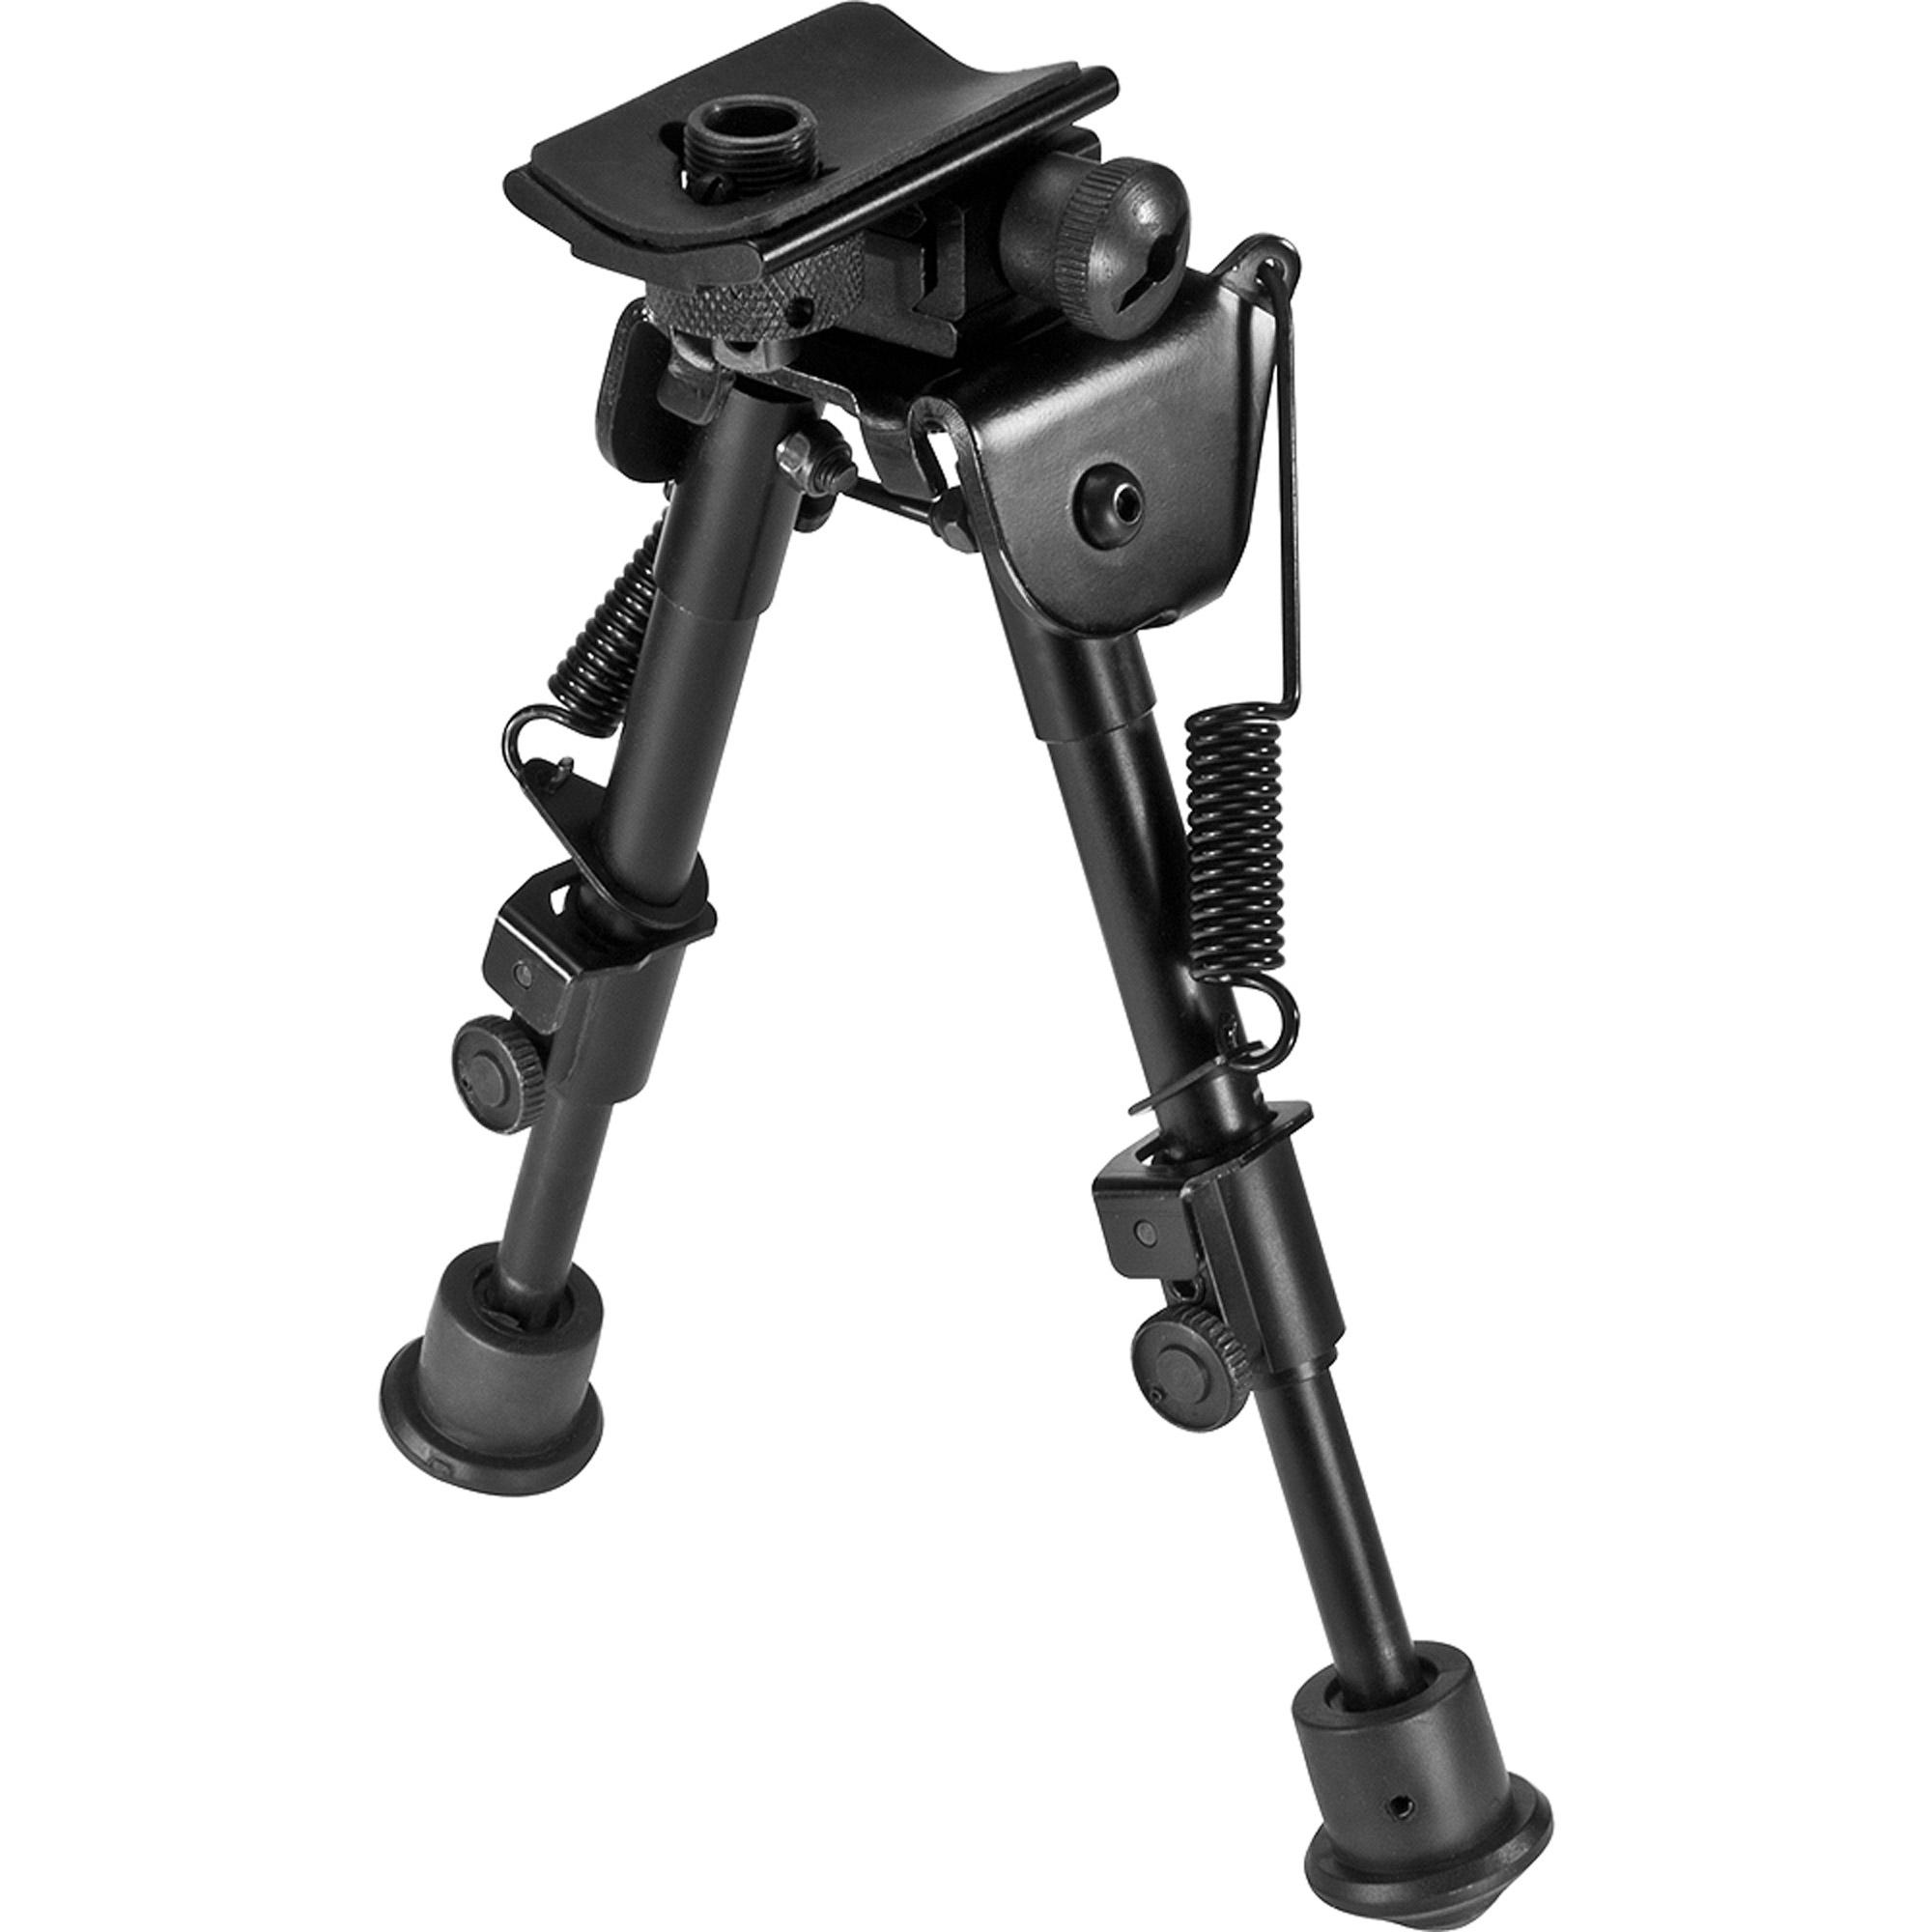 Barska Optics Spring-Loaded Adjustable Bipod, Low